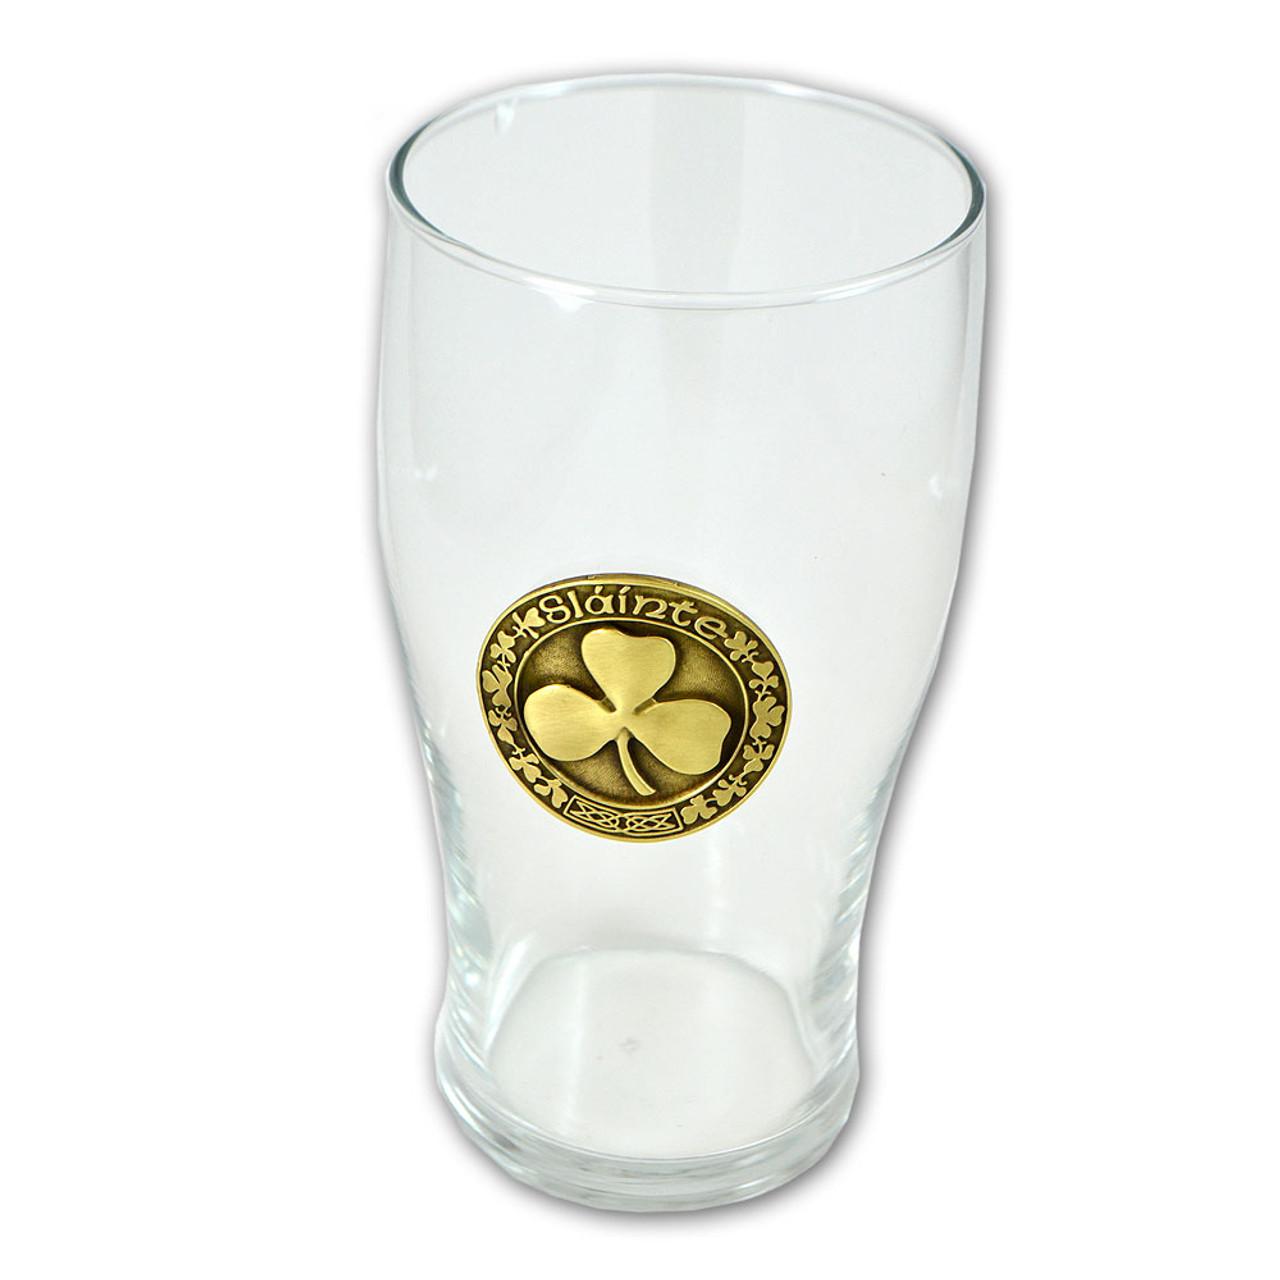 Personalised 1 Pint Tulip Beer Glass With Irish Shamrock Design